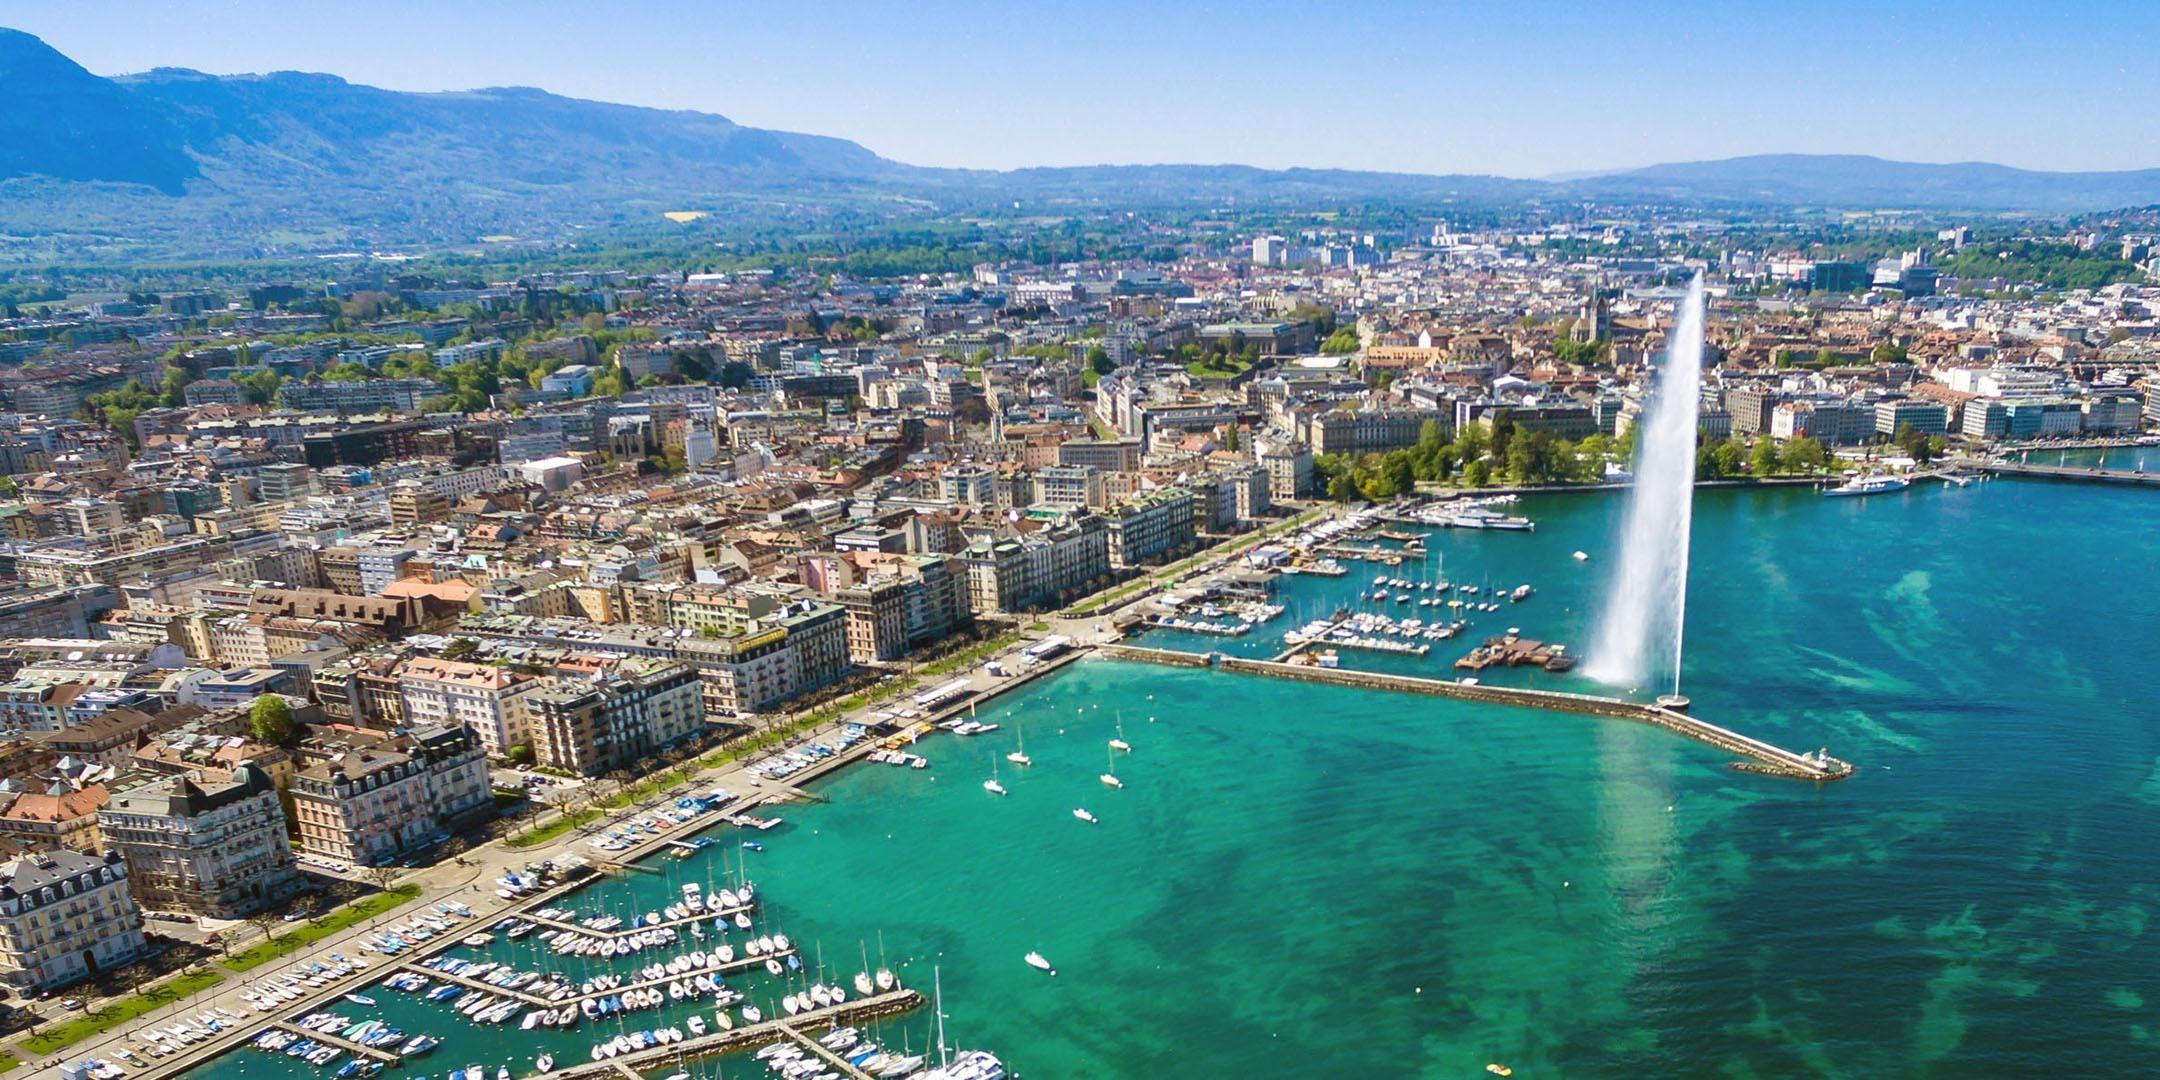 Azure, Office 365 & Dynamics 365 Saturday Geneva 2018